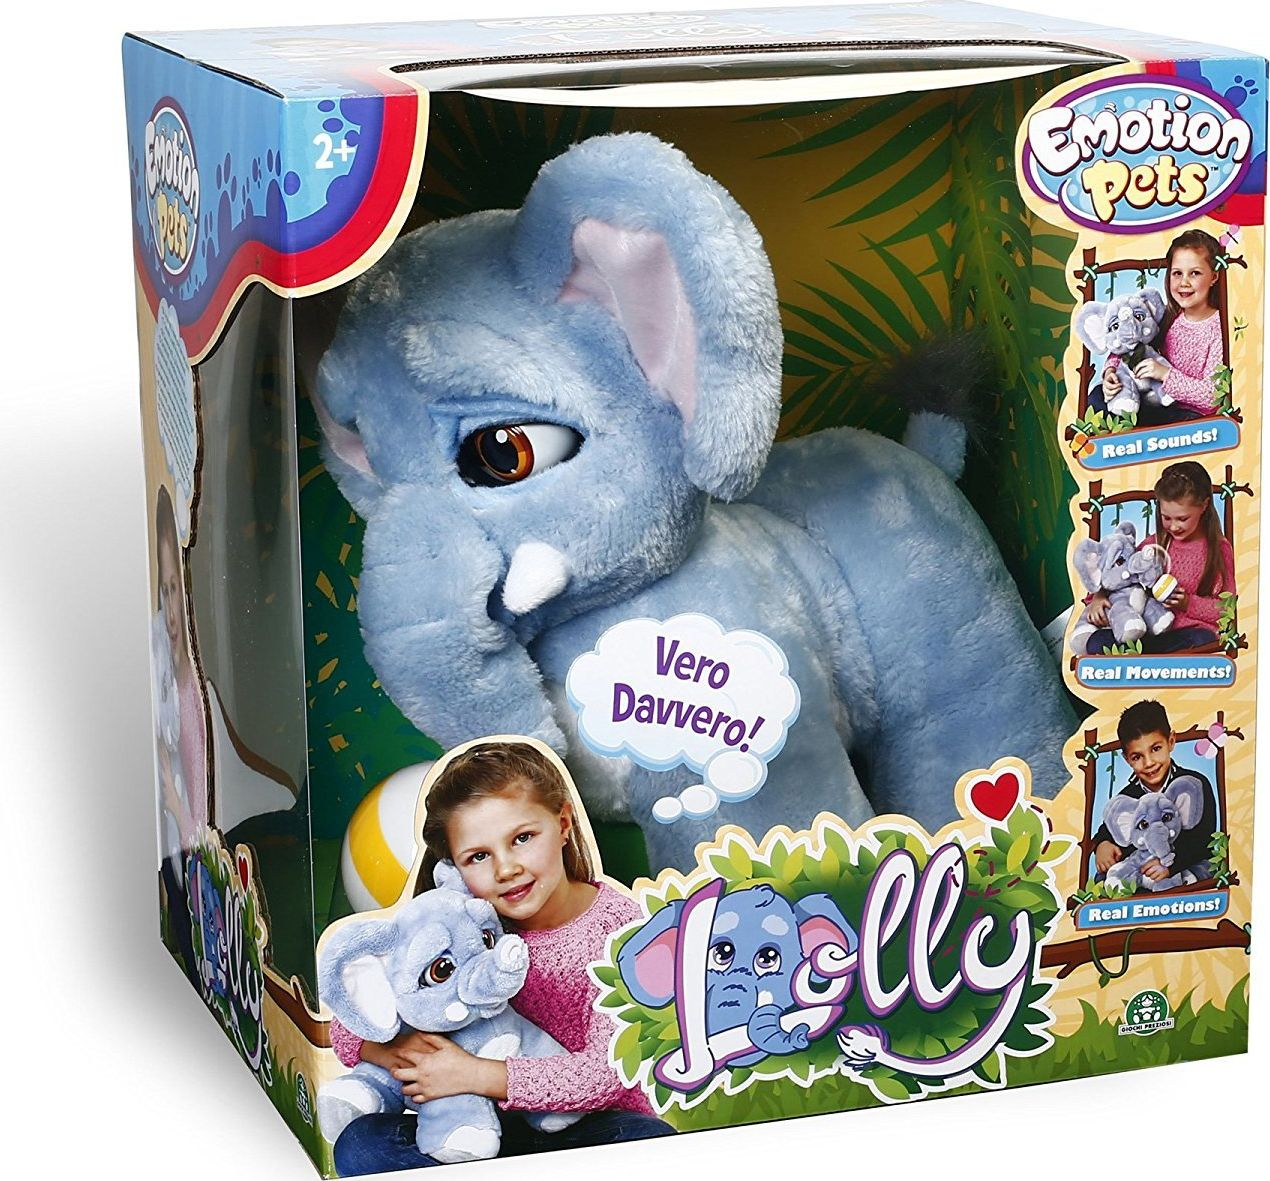 Emotion Pets Slon interaktywny emocje 5673285 bērnu rotaļlieta